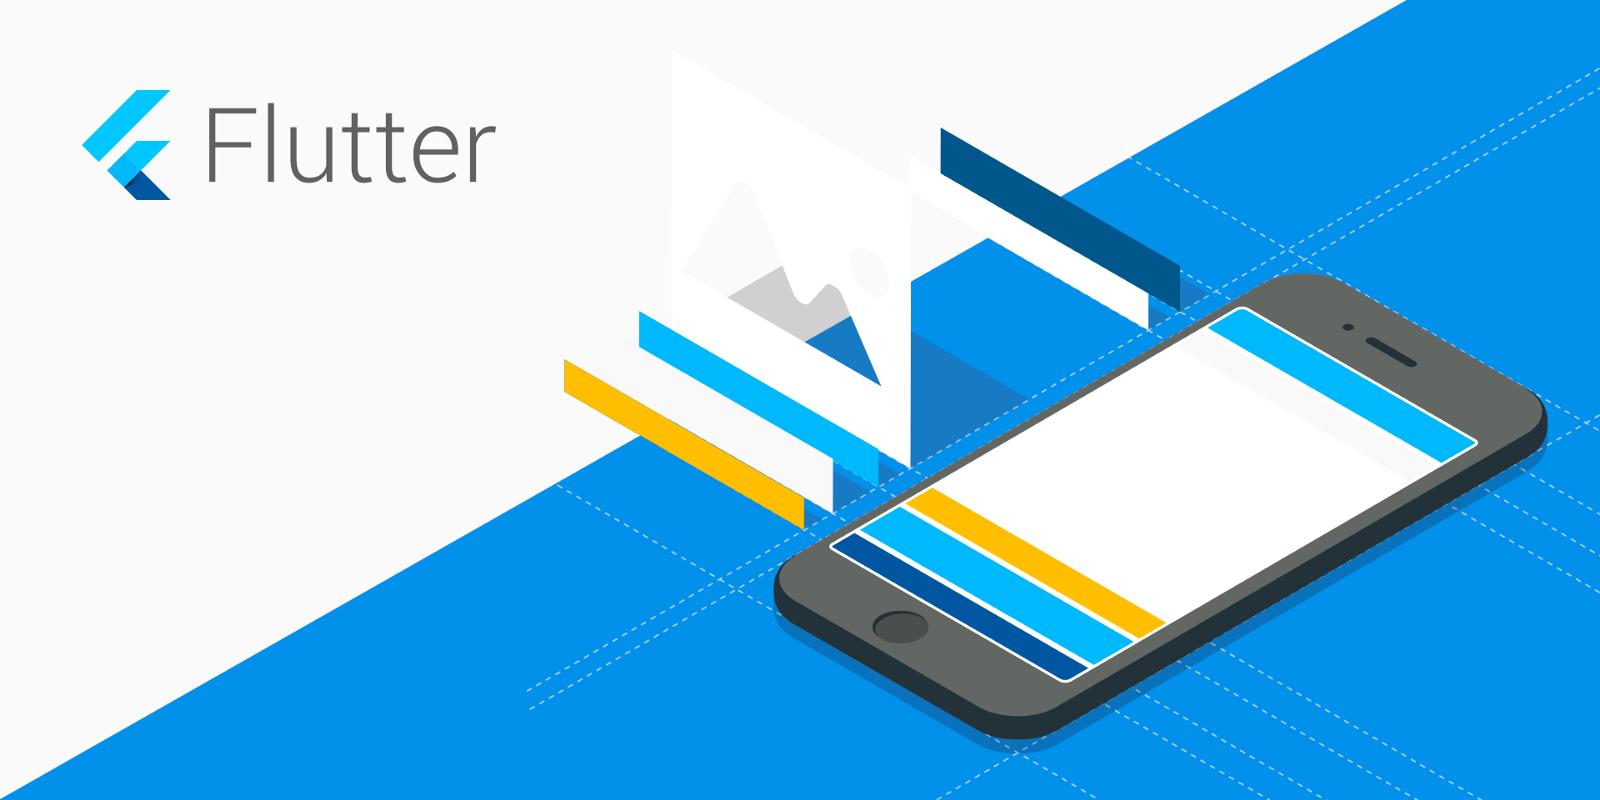 Why we use flutter for app development?